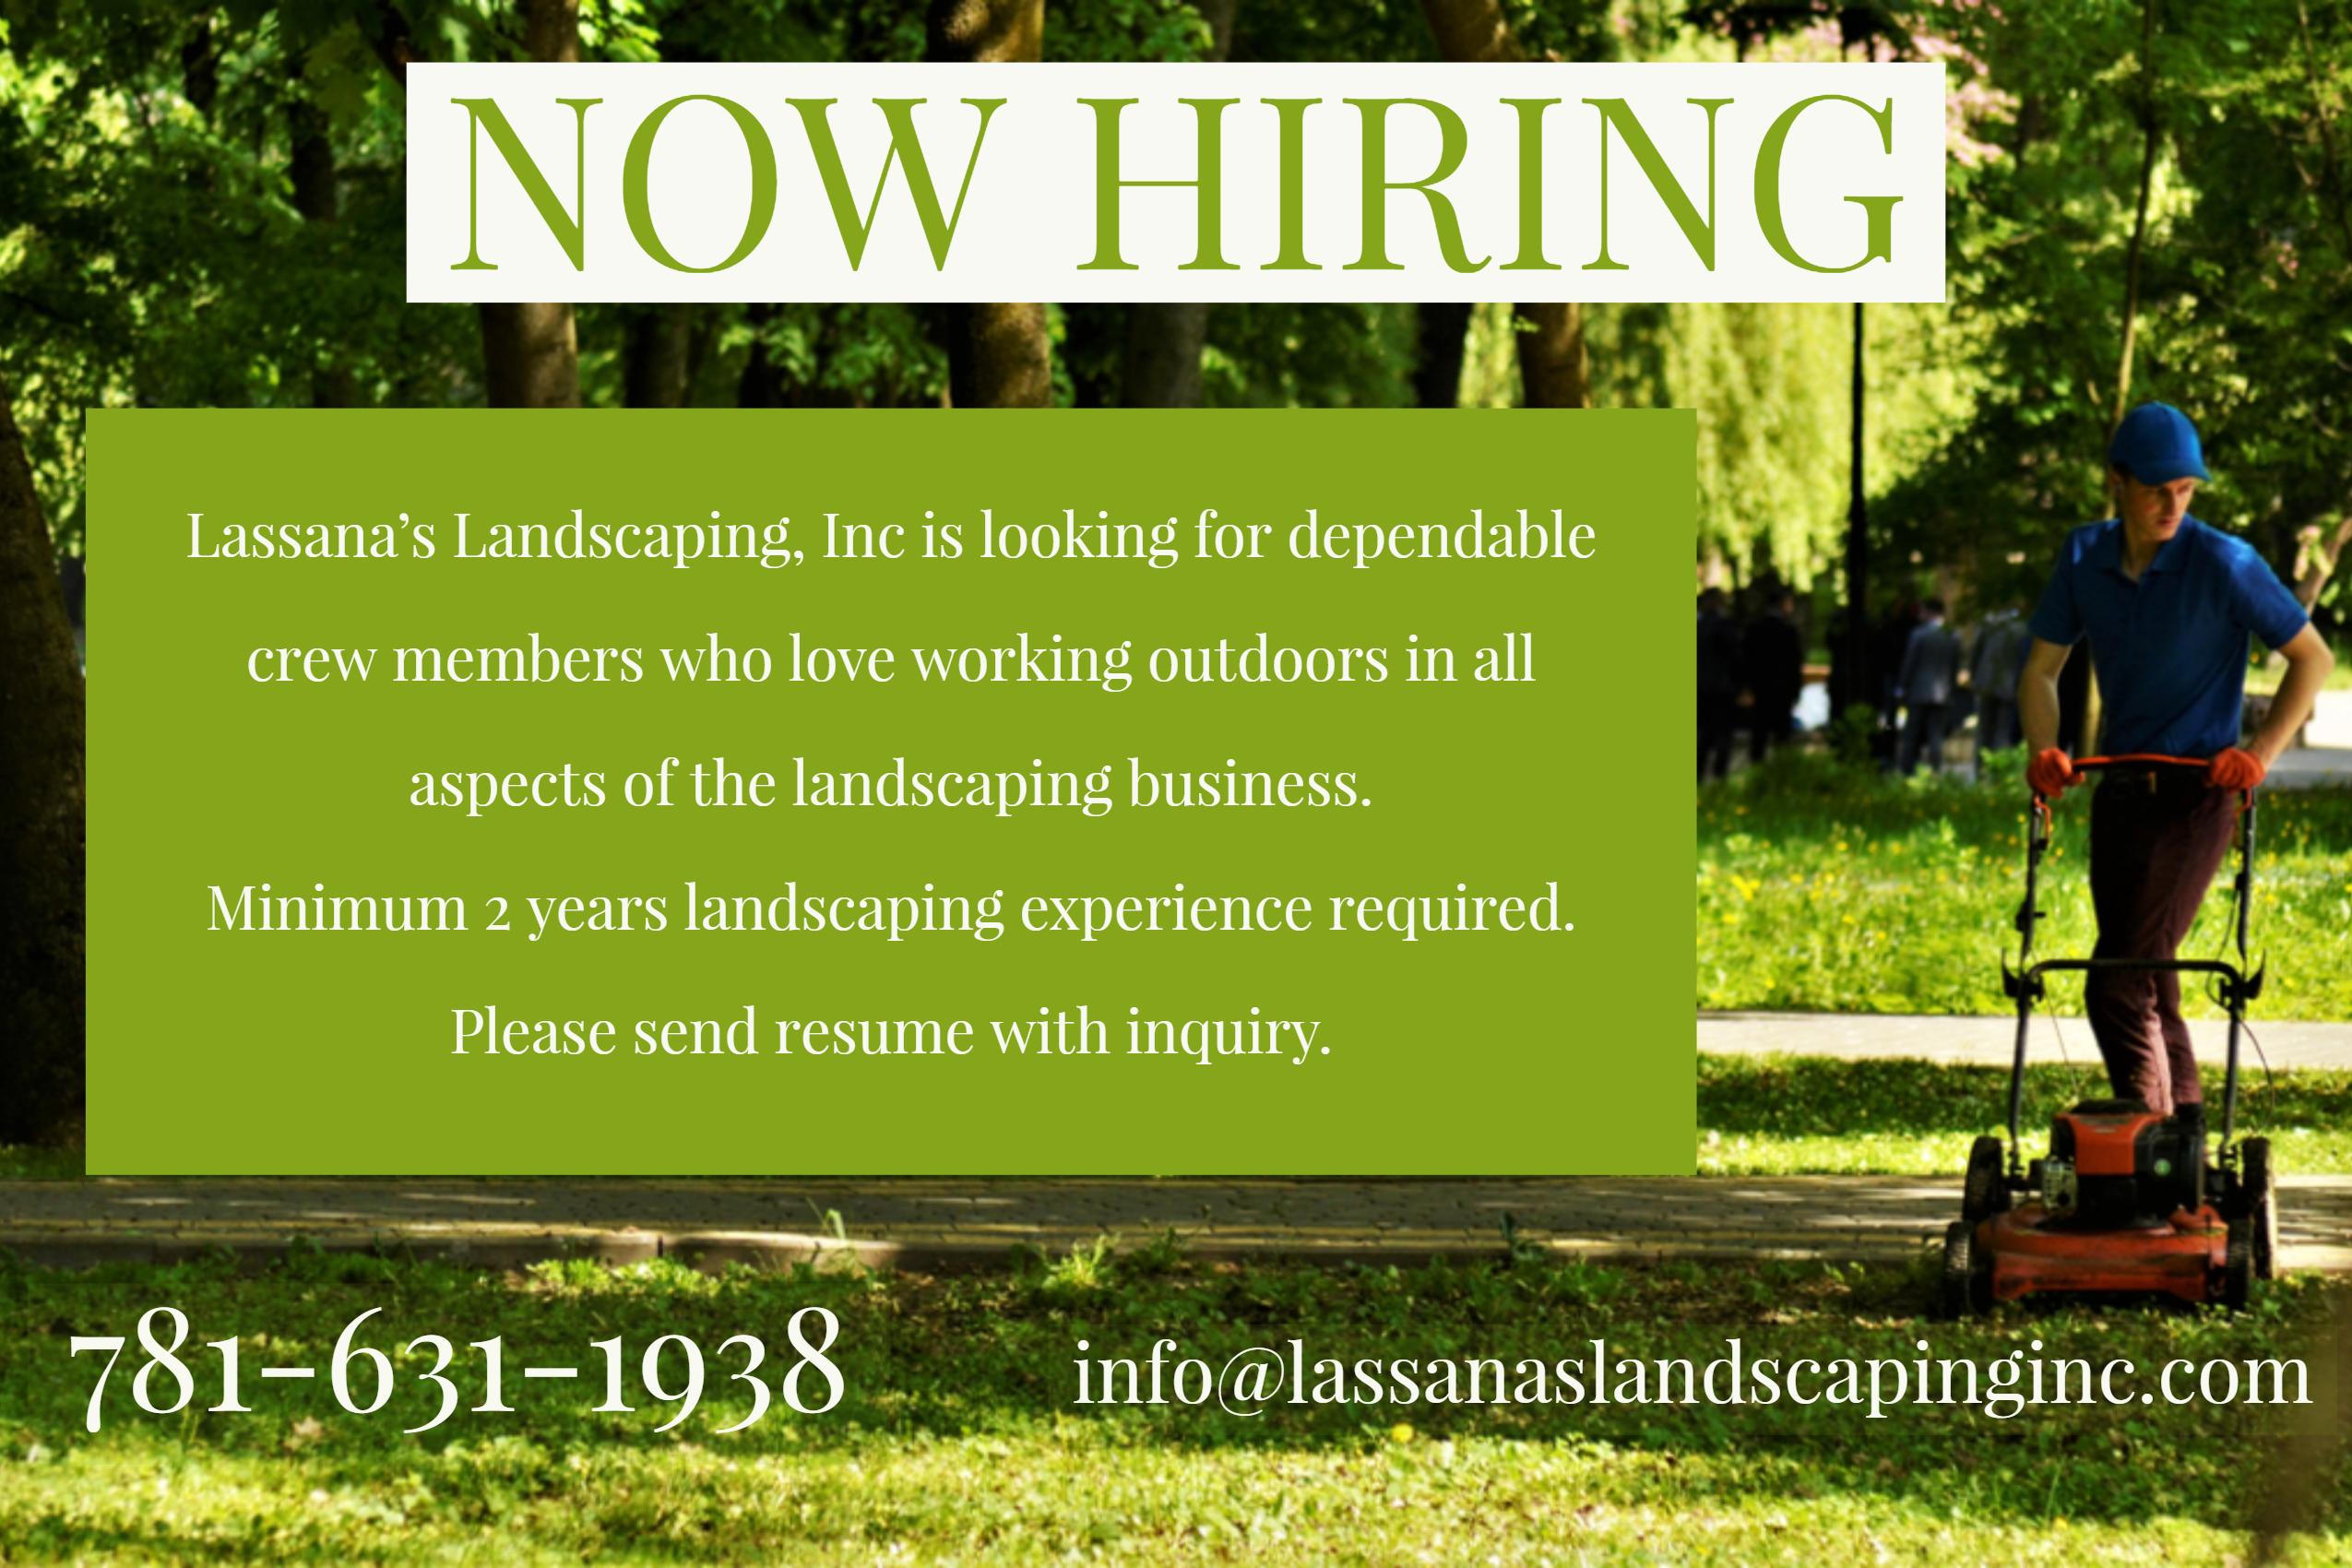 lassanas landscaping is hiring